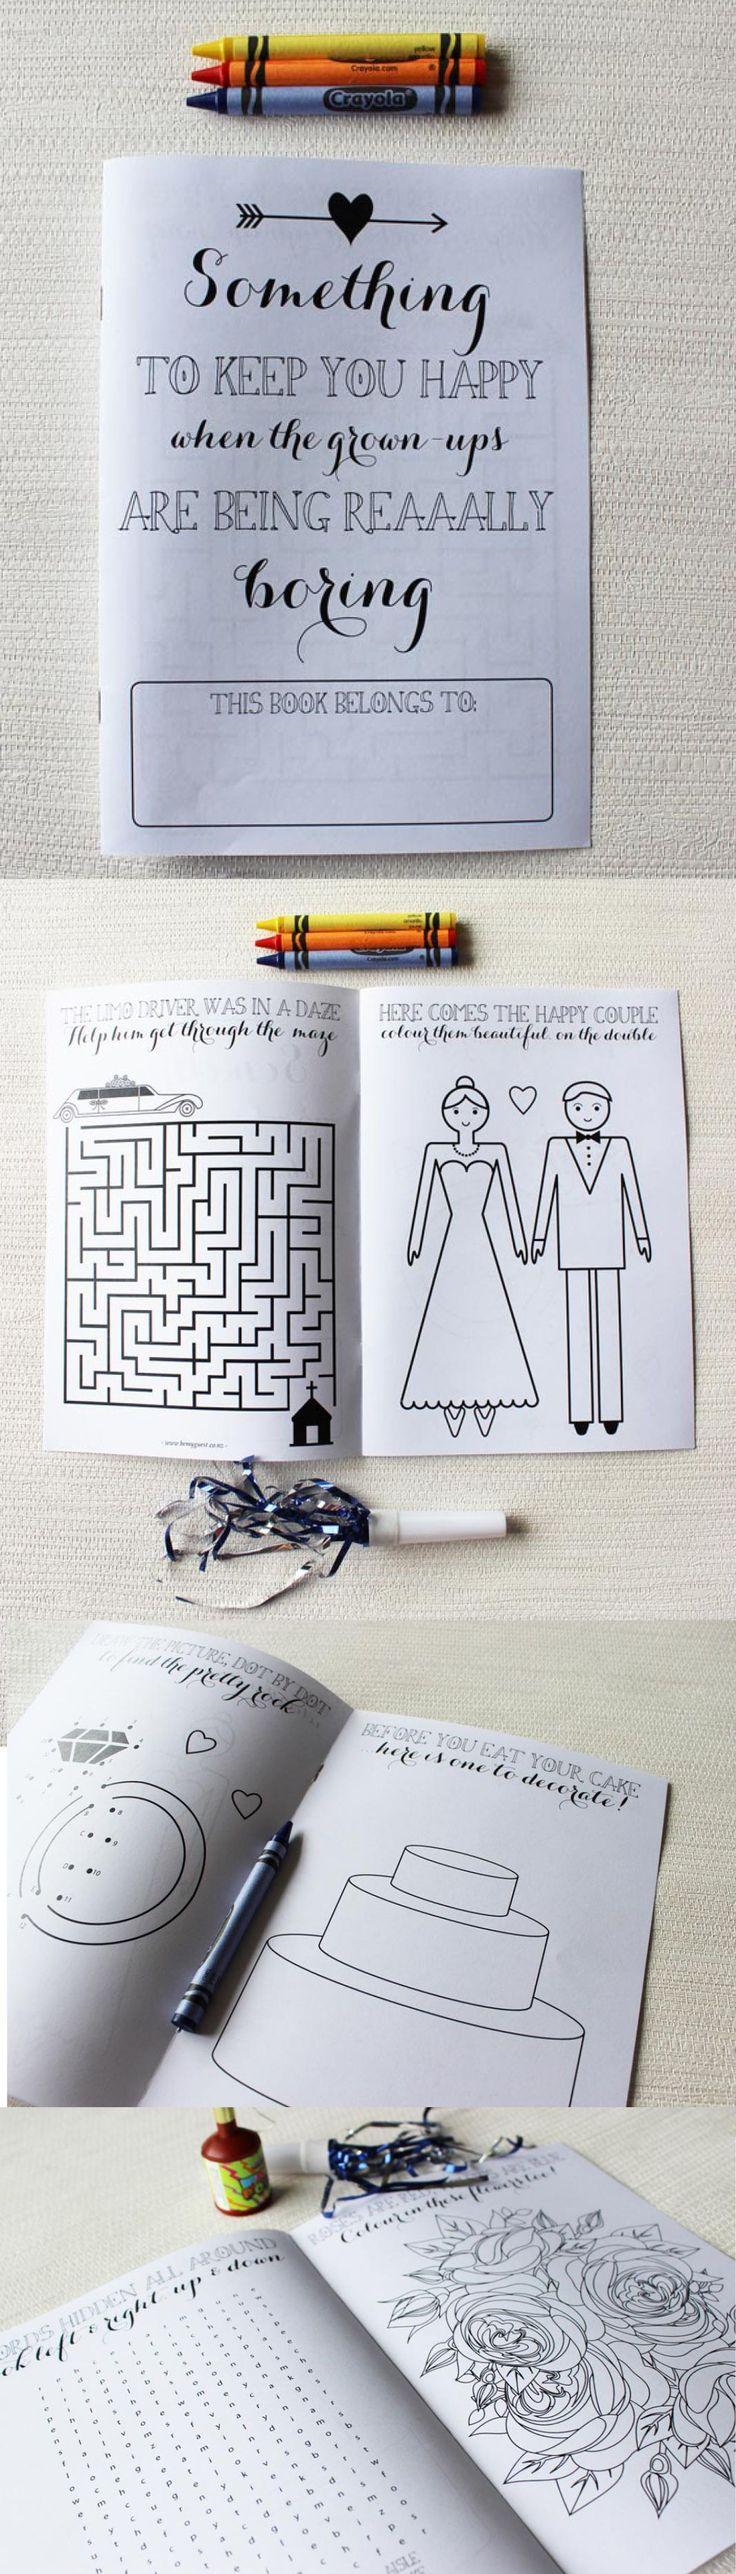 Wedding Activities Ideas Invitationsjdi